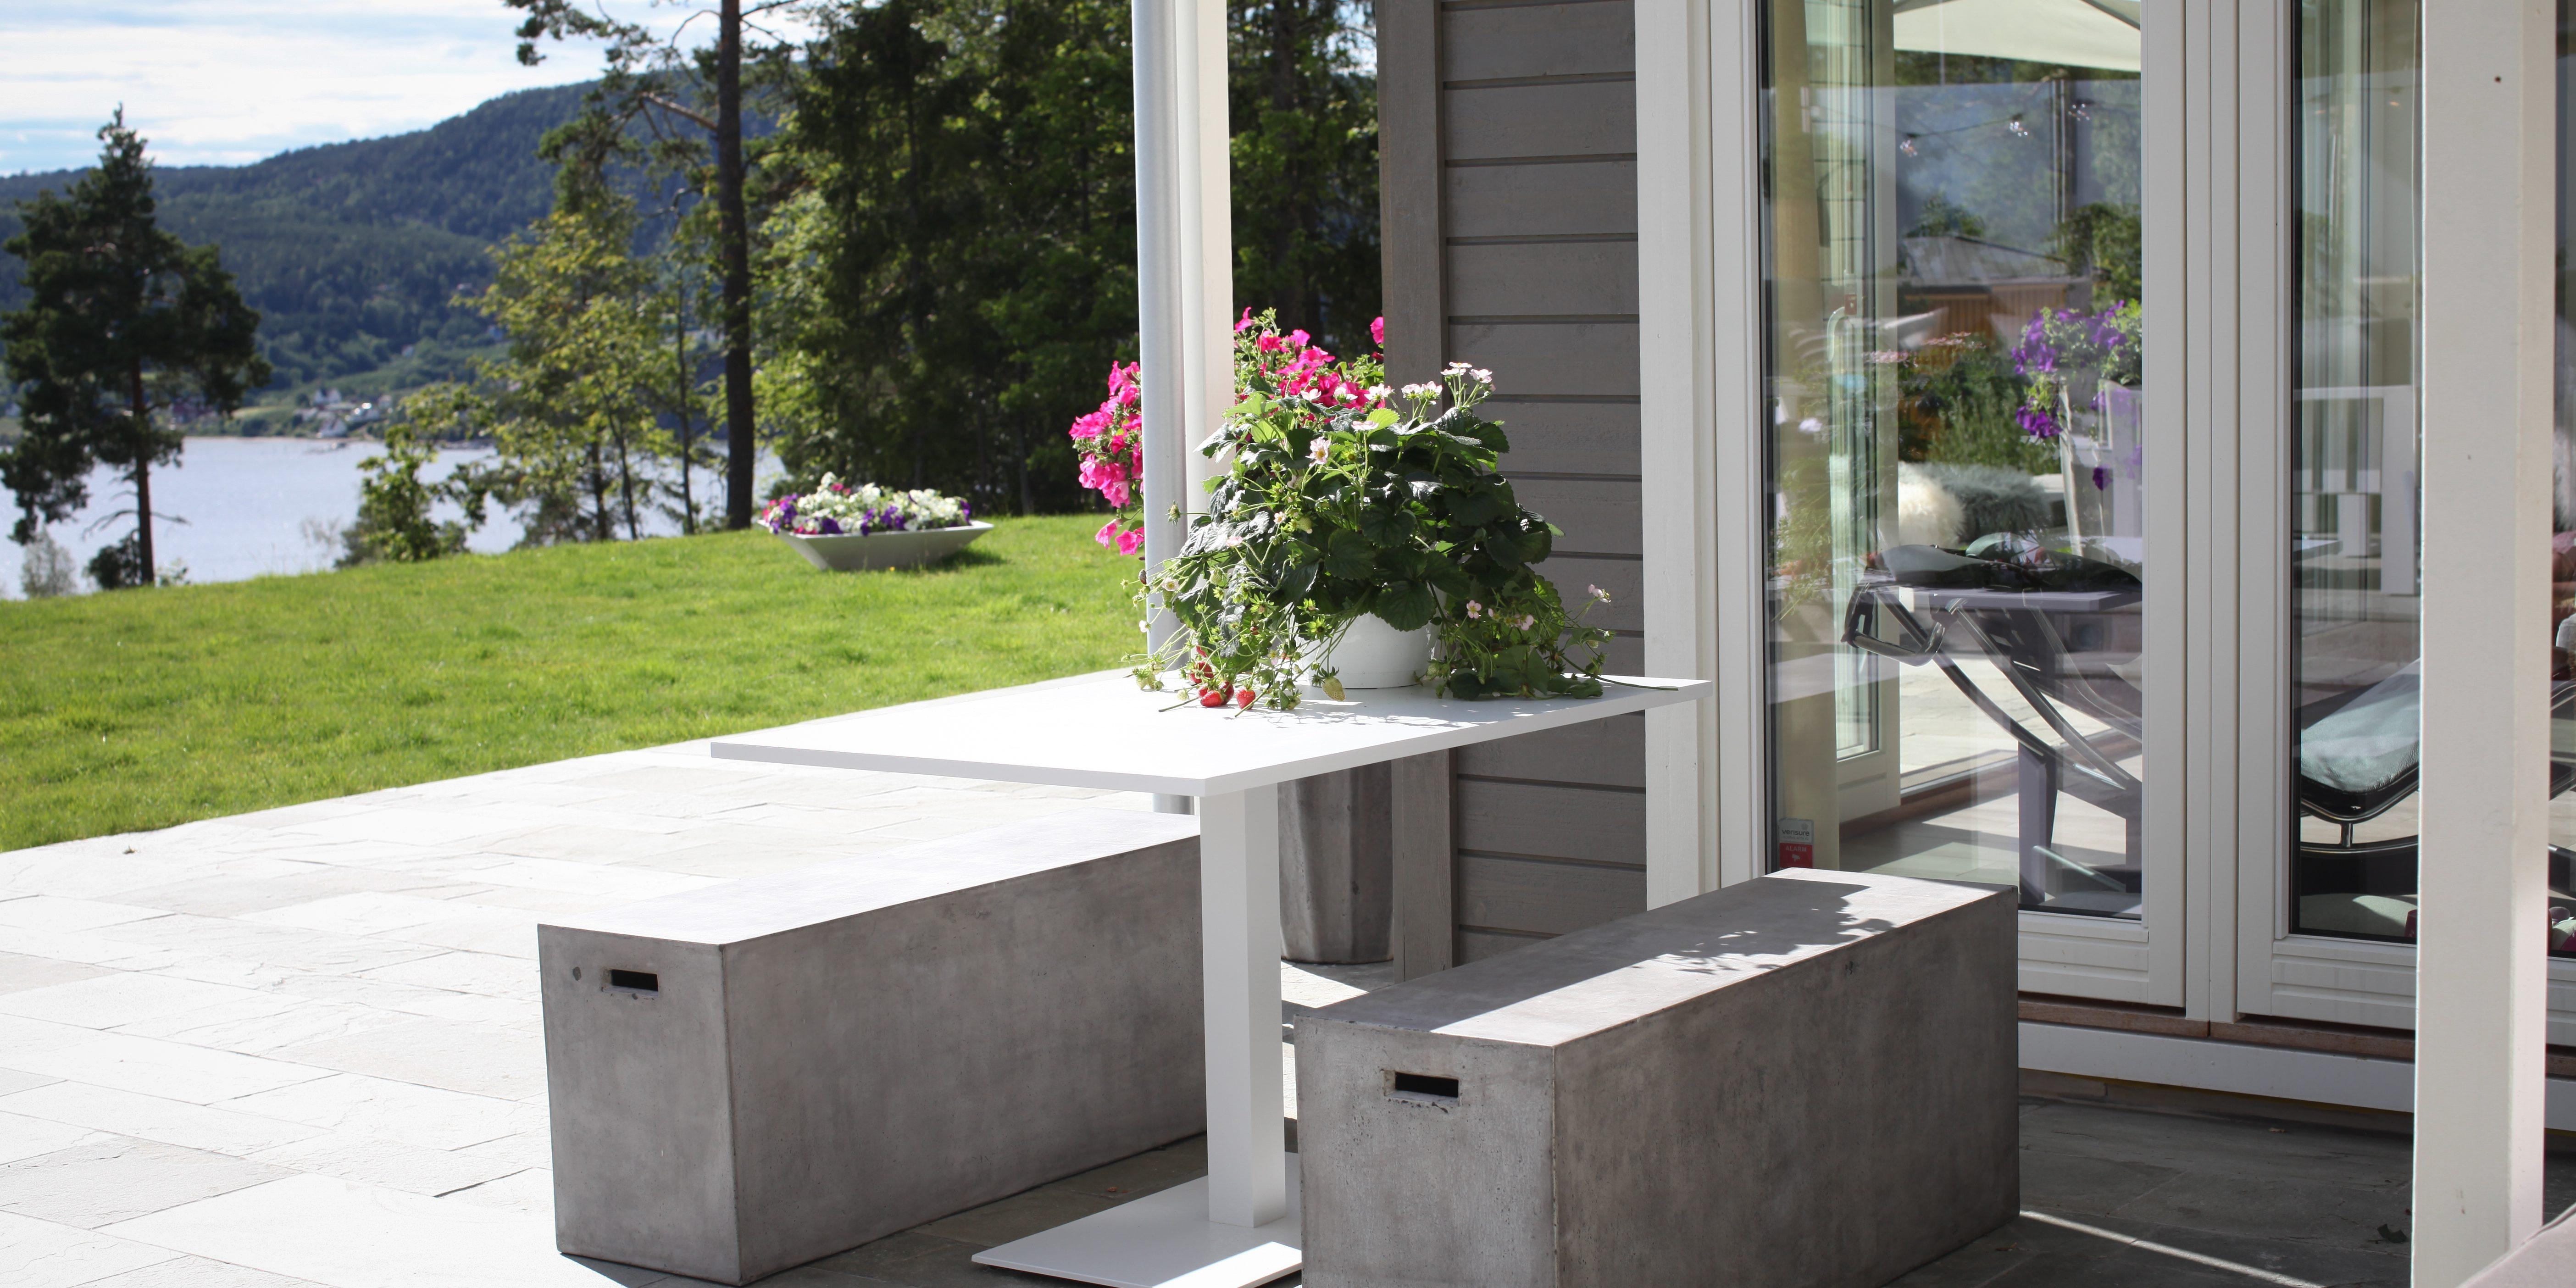 Avansert Salg - hagemøbler! Spar fra 20-70% på utemøbler fra Fine Design WJ-03